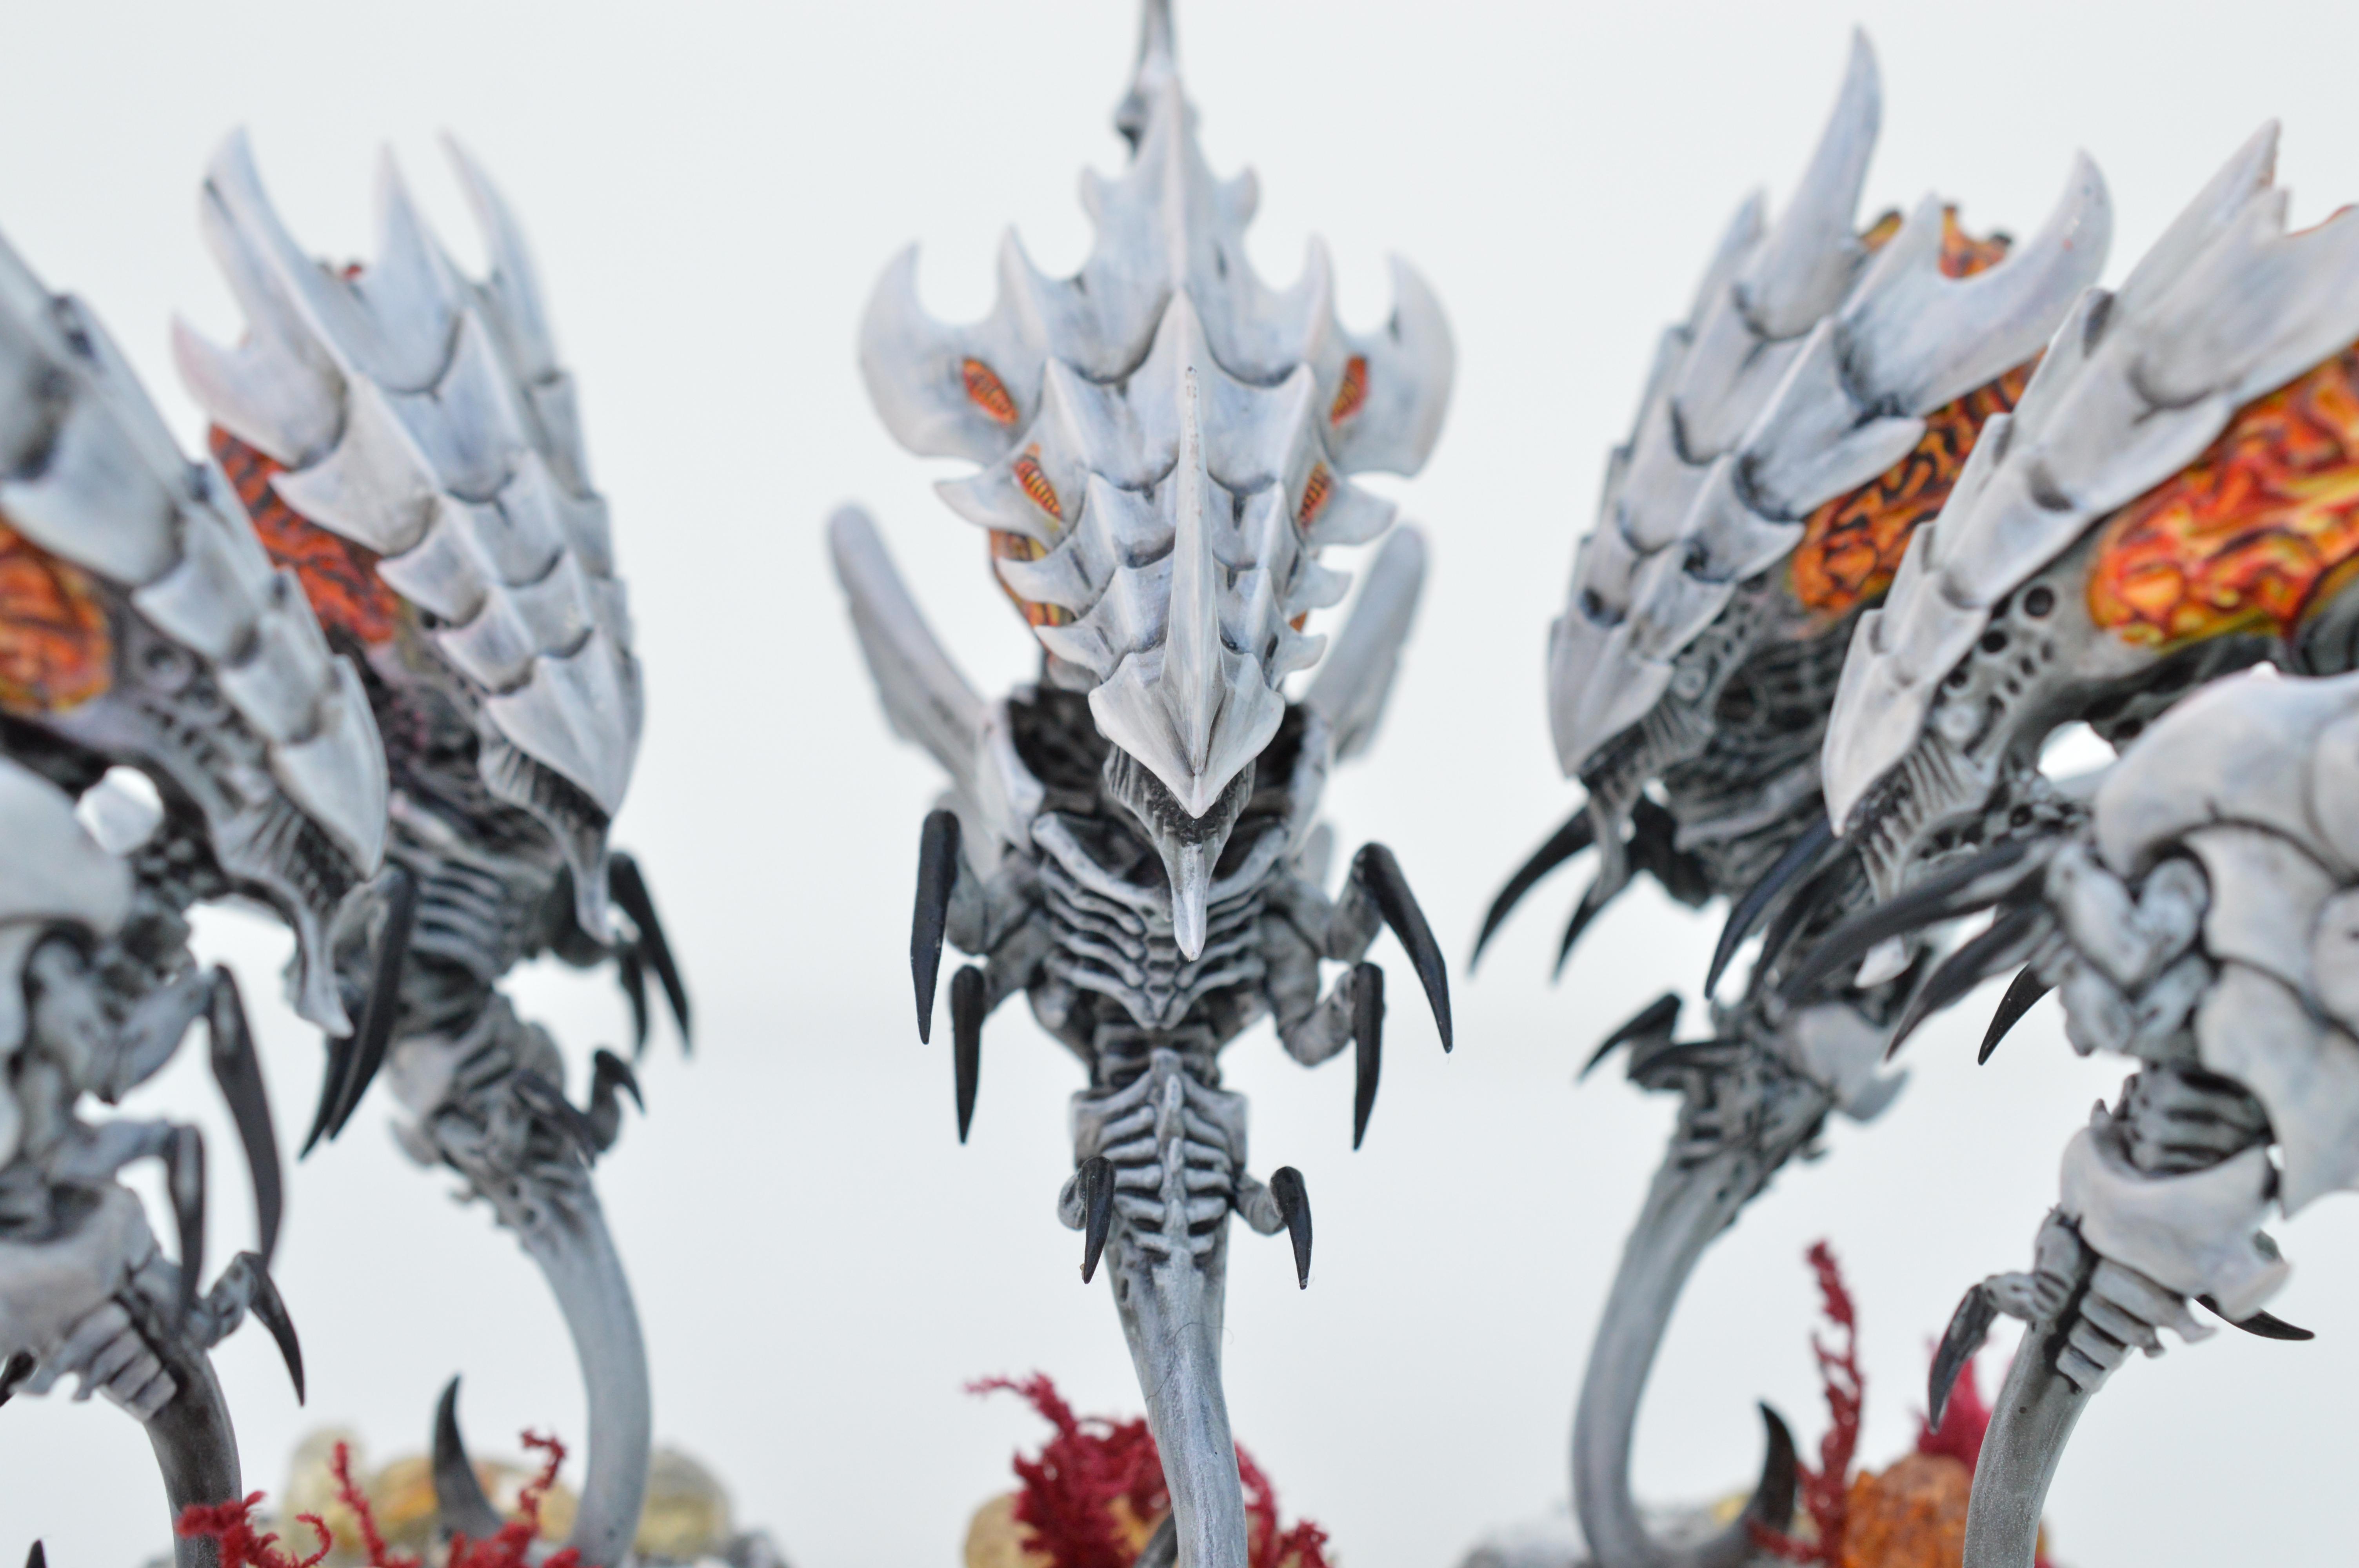 Black, Hive Fleet Typhon, Red, Tyranids, White